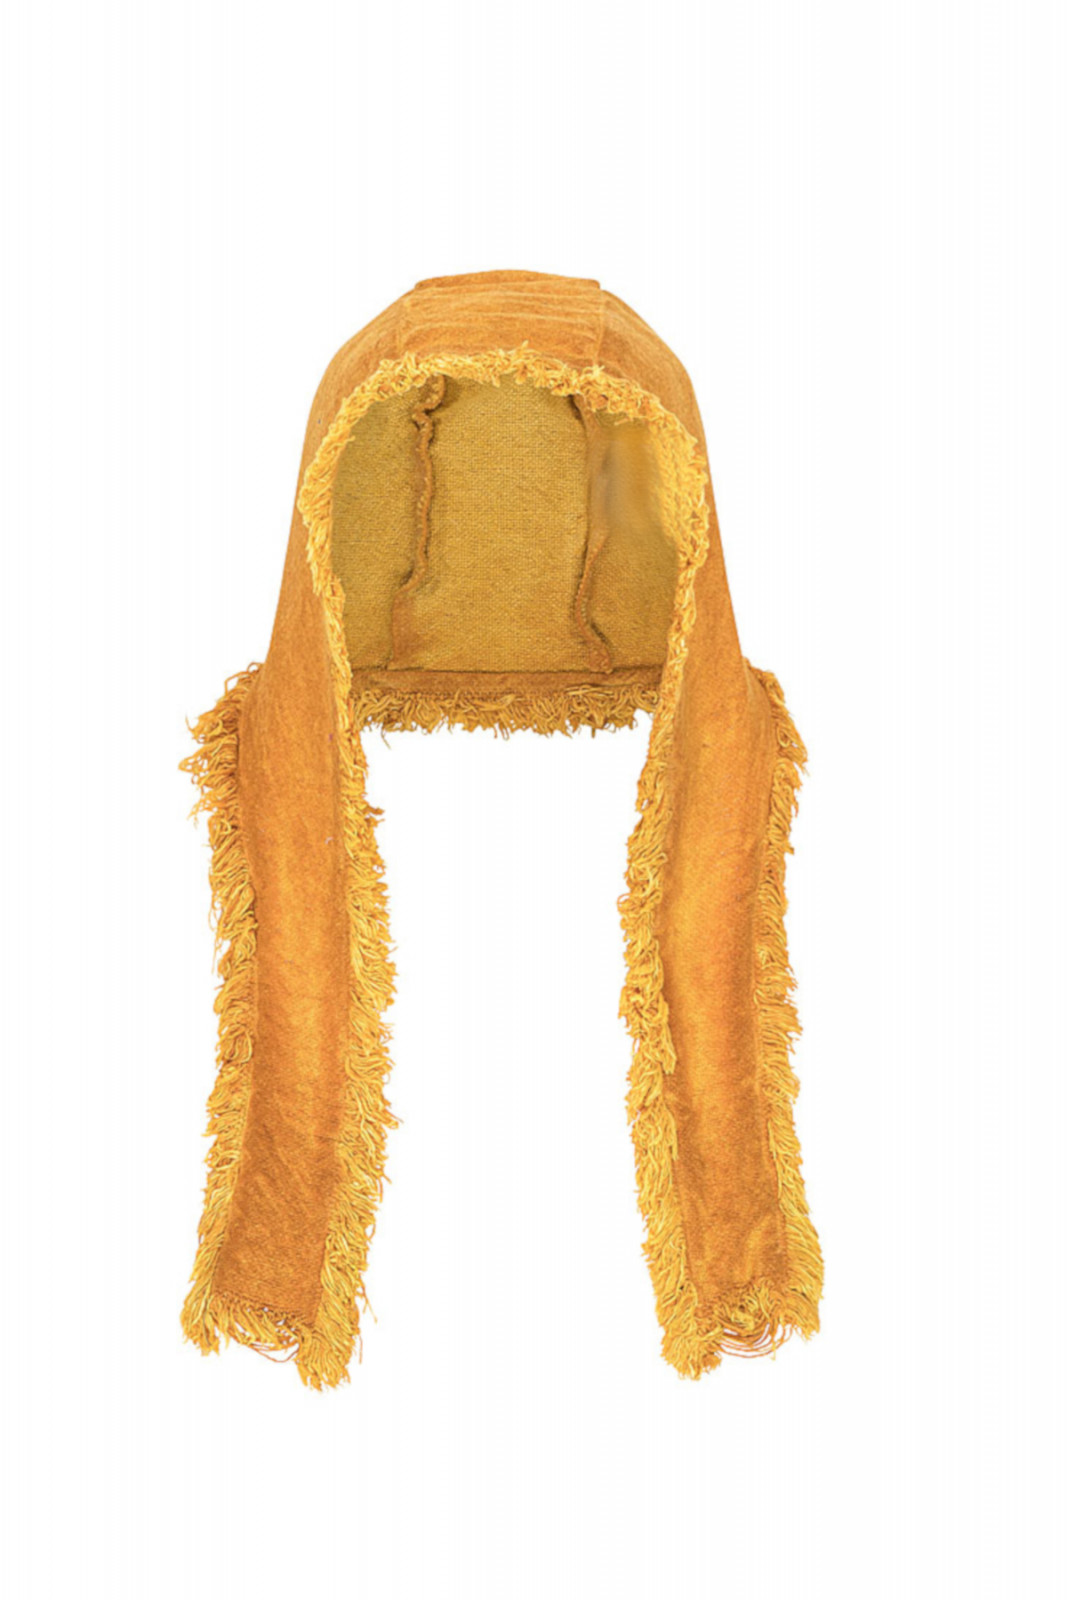 Josse - Bundhaube gelb